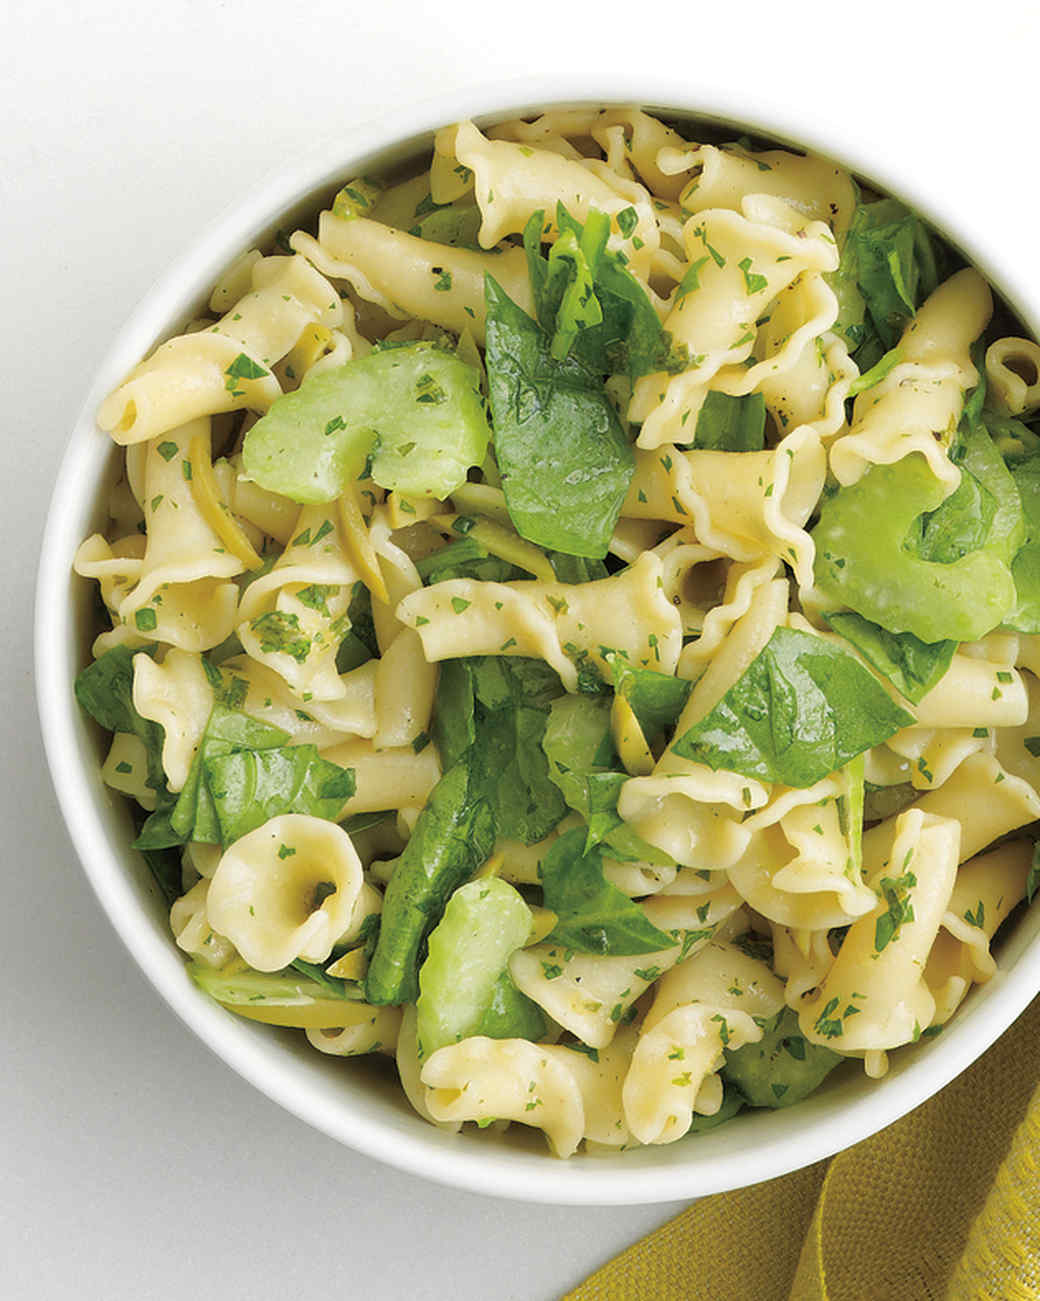 tangy-pasta-spinach-med108164.jpg